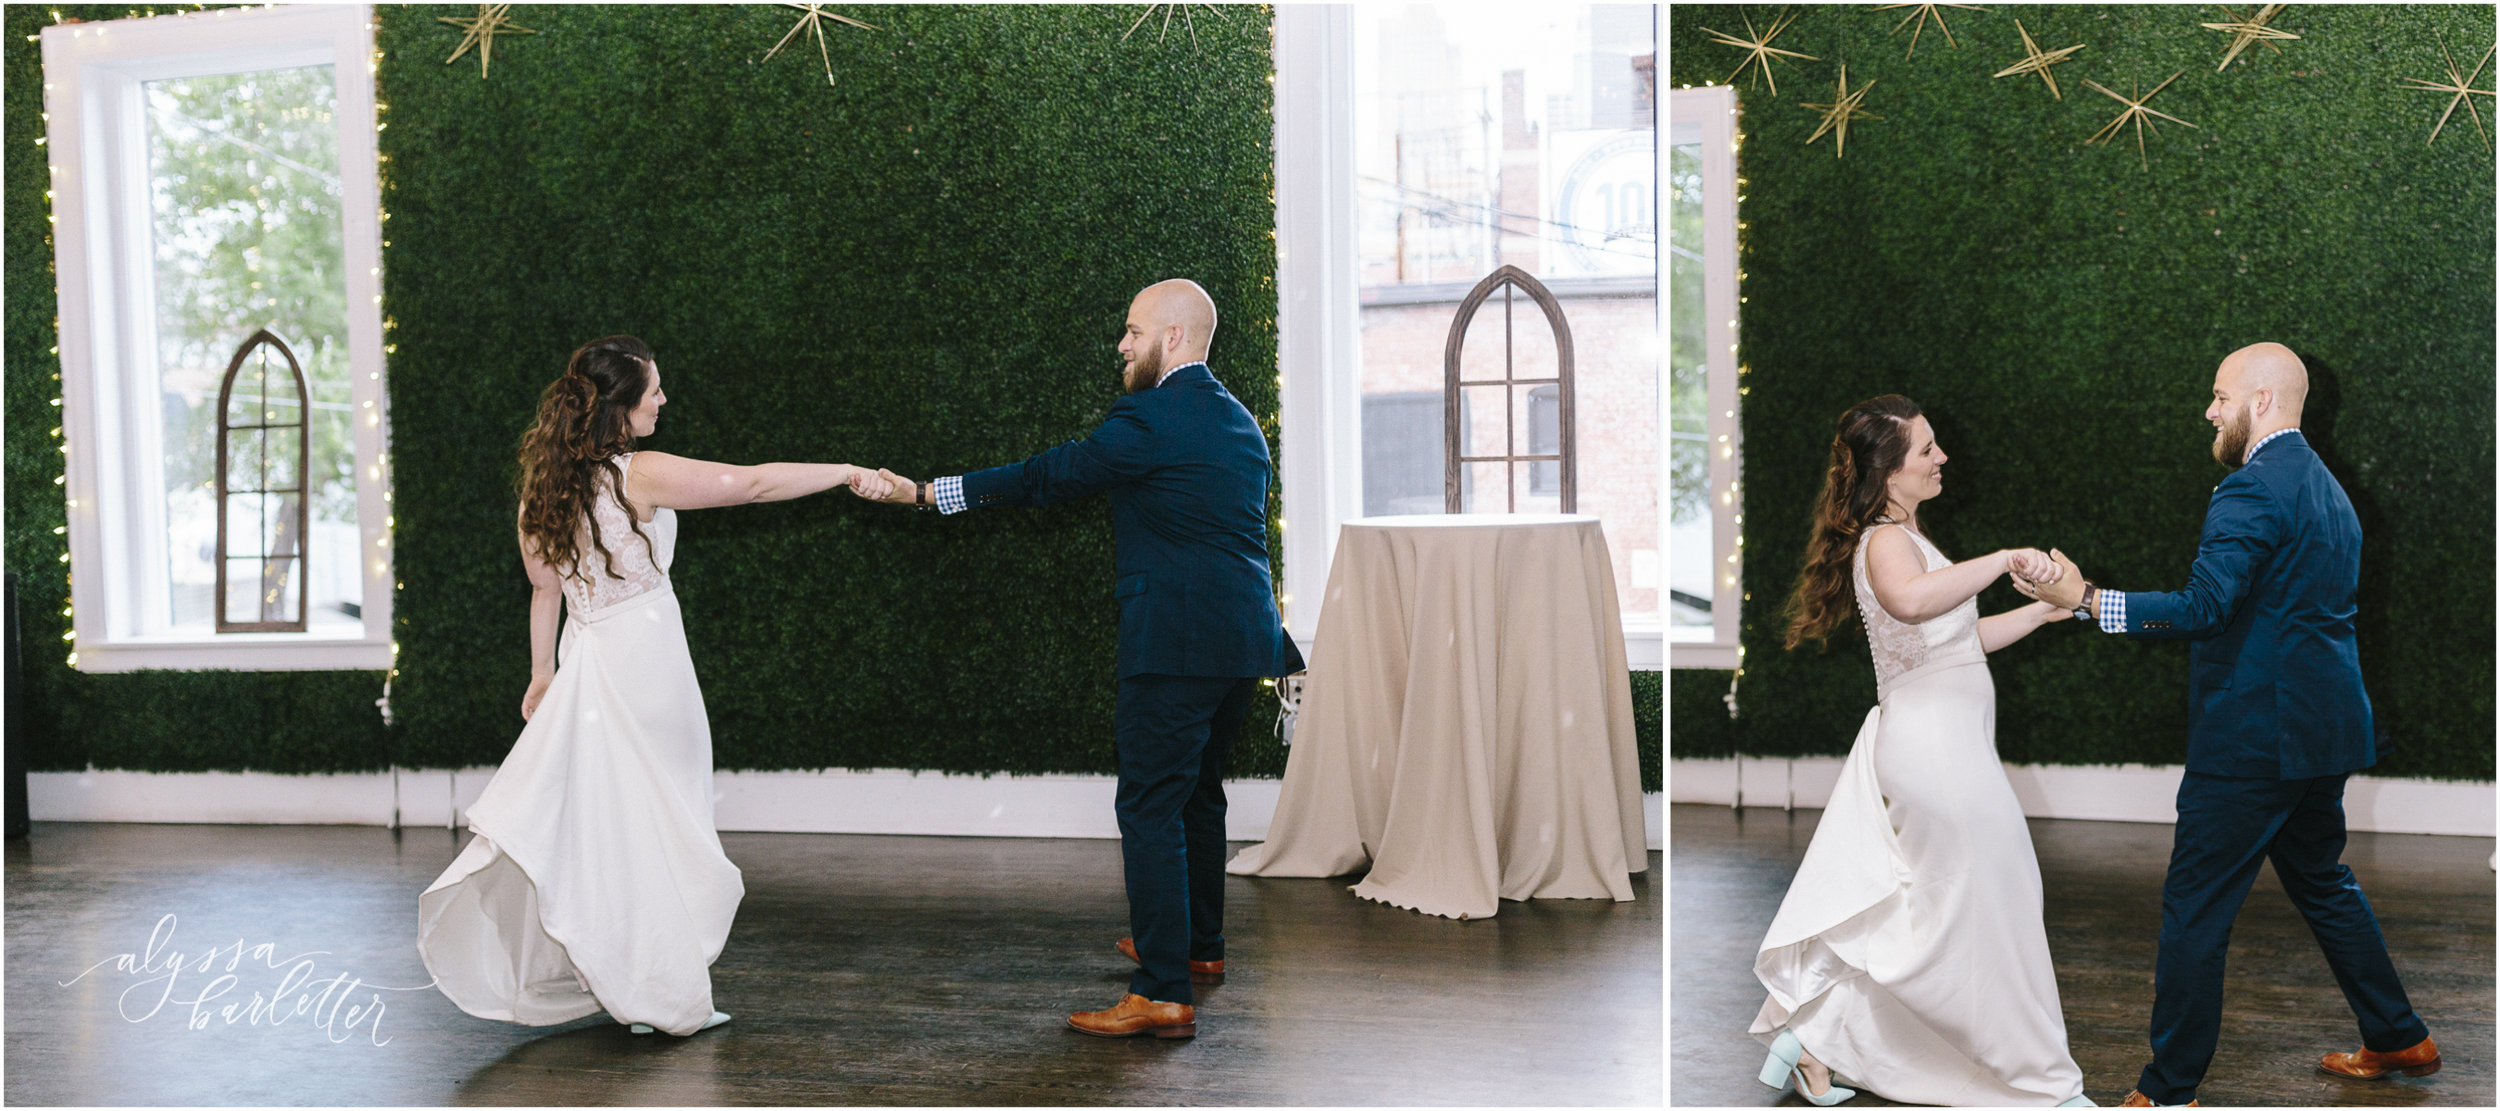 alyssa barletter photography kansas city wedding 2016 main courtney and brian-1-49.jpg